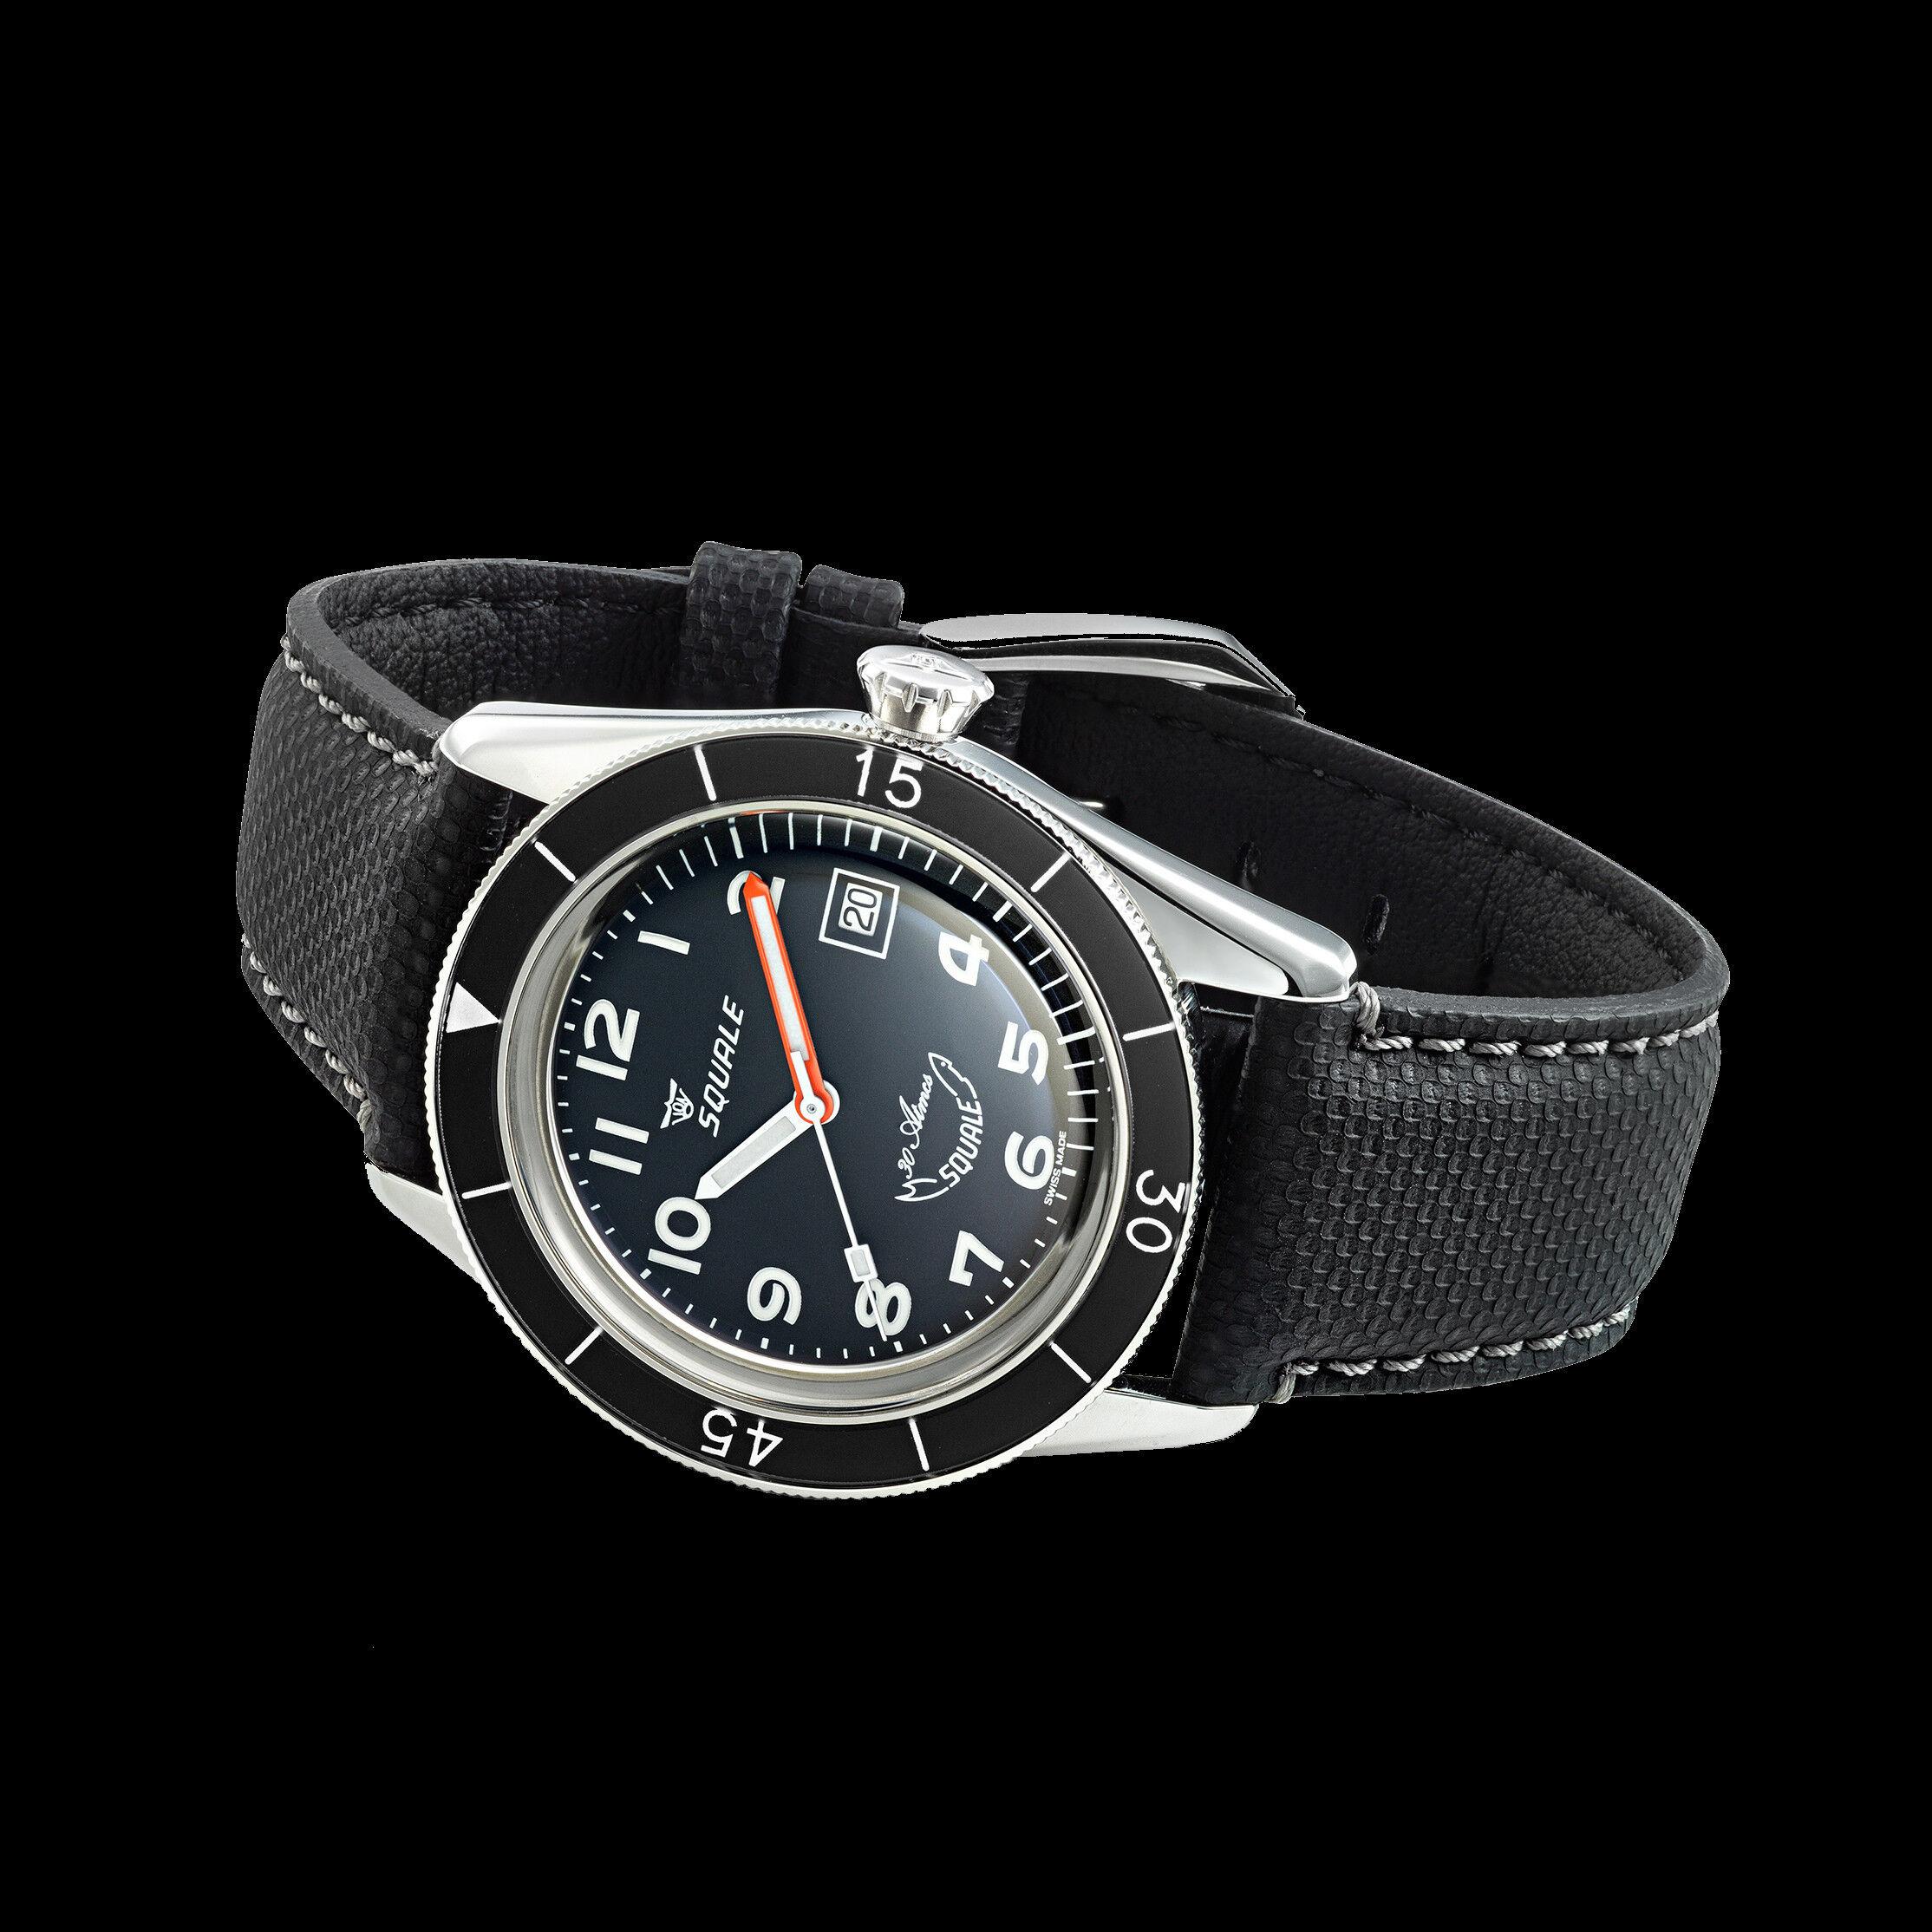 Squale Black Arabic SUB-39 Dive Watch